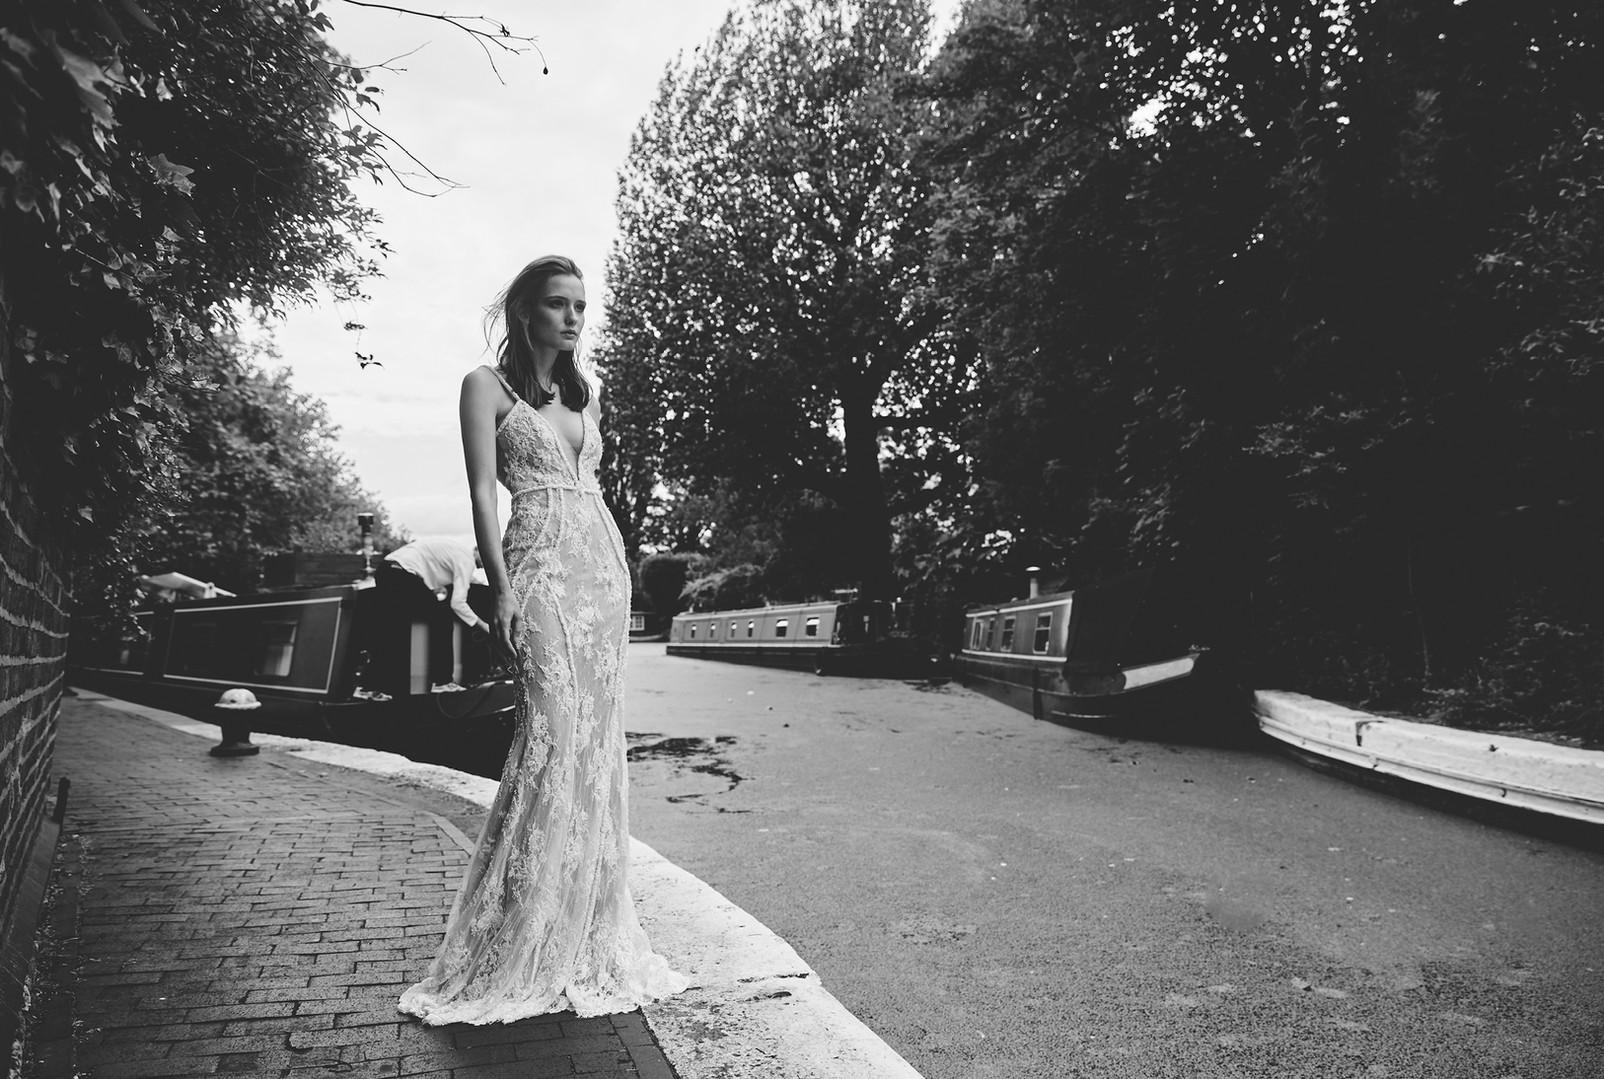 Liz Martinez  Hagay Dor    Victoria Todd  Judith Leclerc   Elite London   Liron Weissman Fashion Photographer   בחגי דור   ליז מרטינז   לירון ויסמן צלמת אופנ